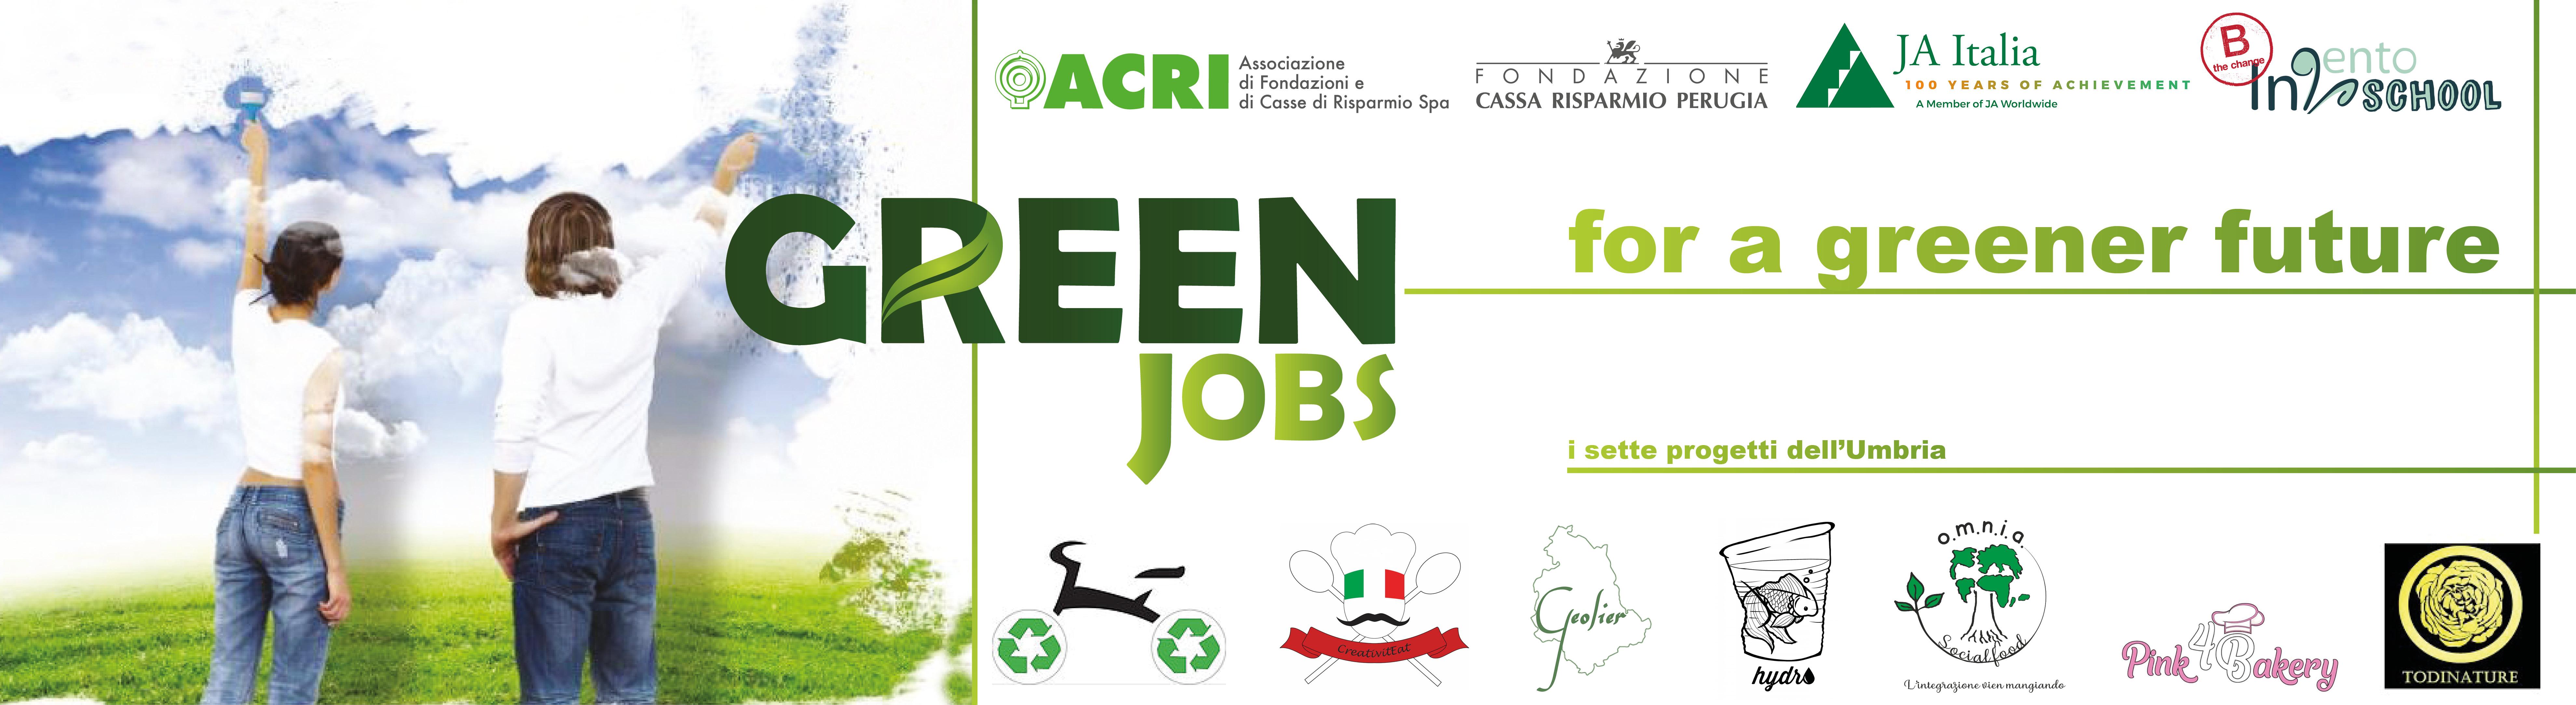 Green Job_banner 1900x520 con marchi